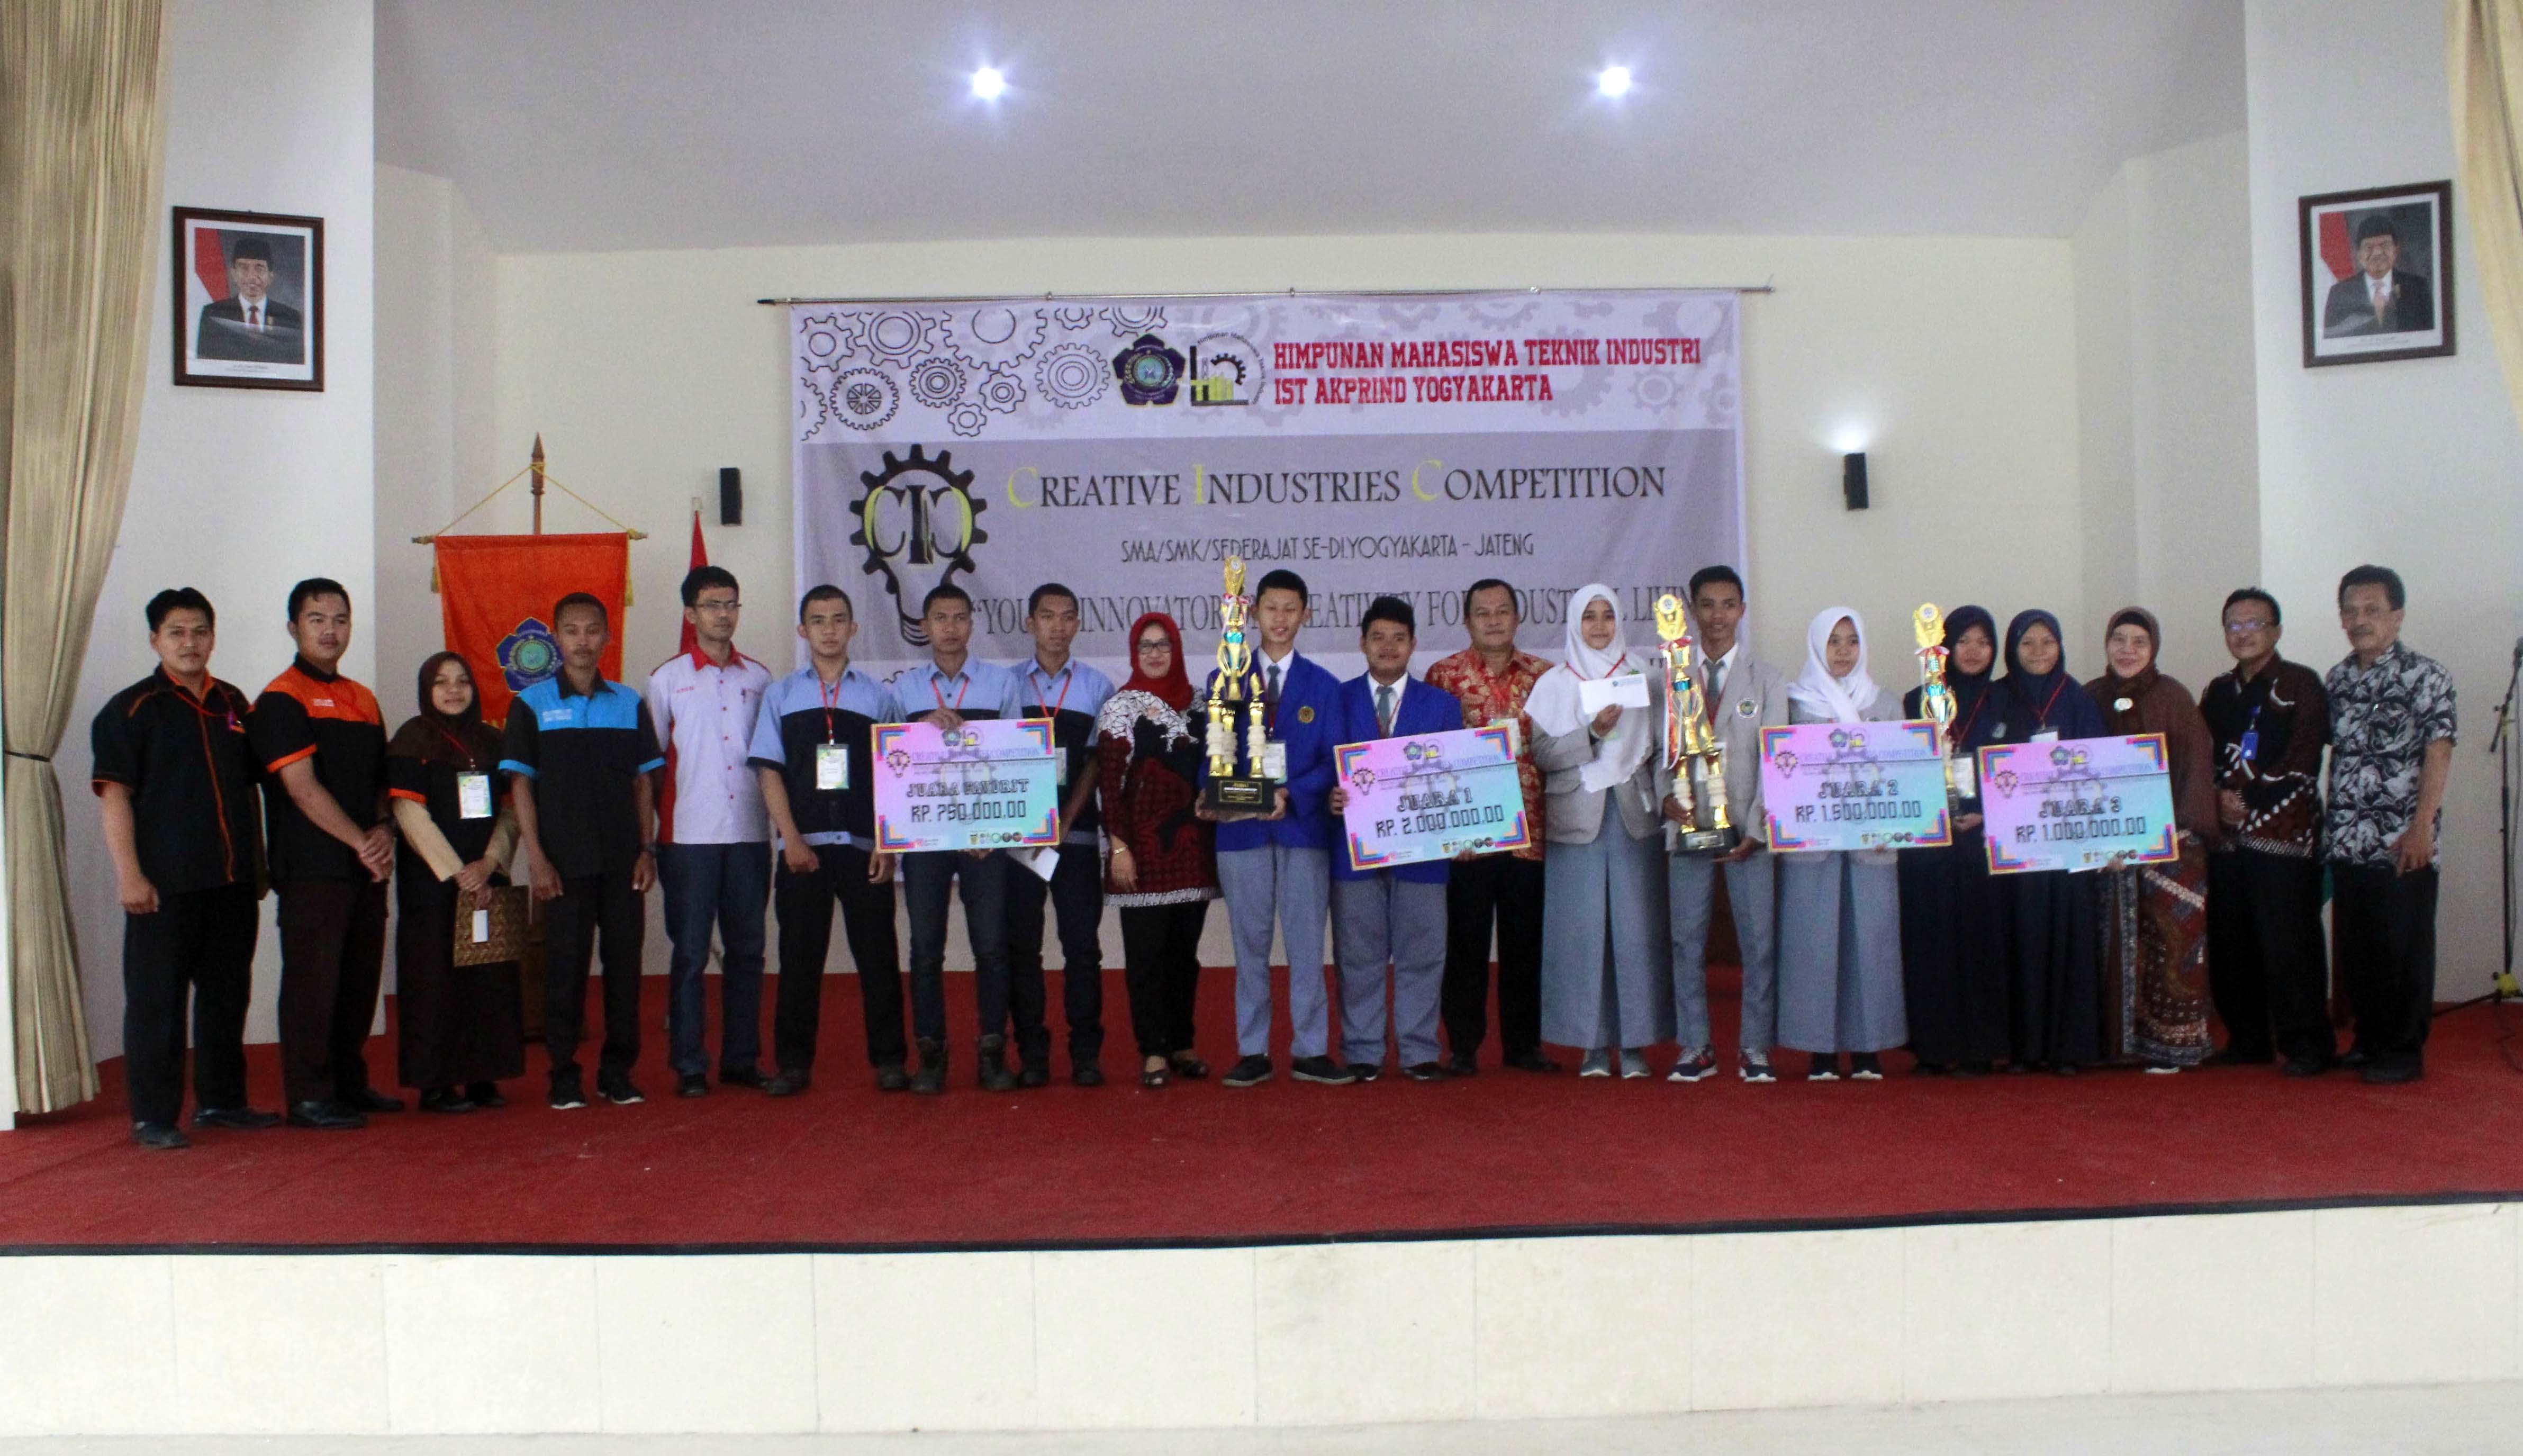 Penyerahan hadiah CIC 2018 tingkat SMA-SMK Sederajat Jurusan Teknik Industri